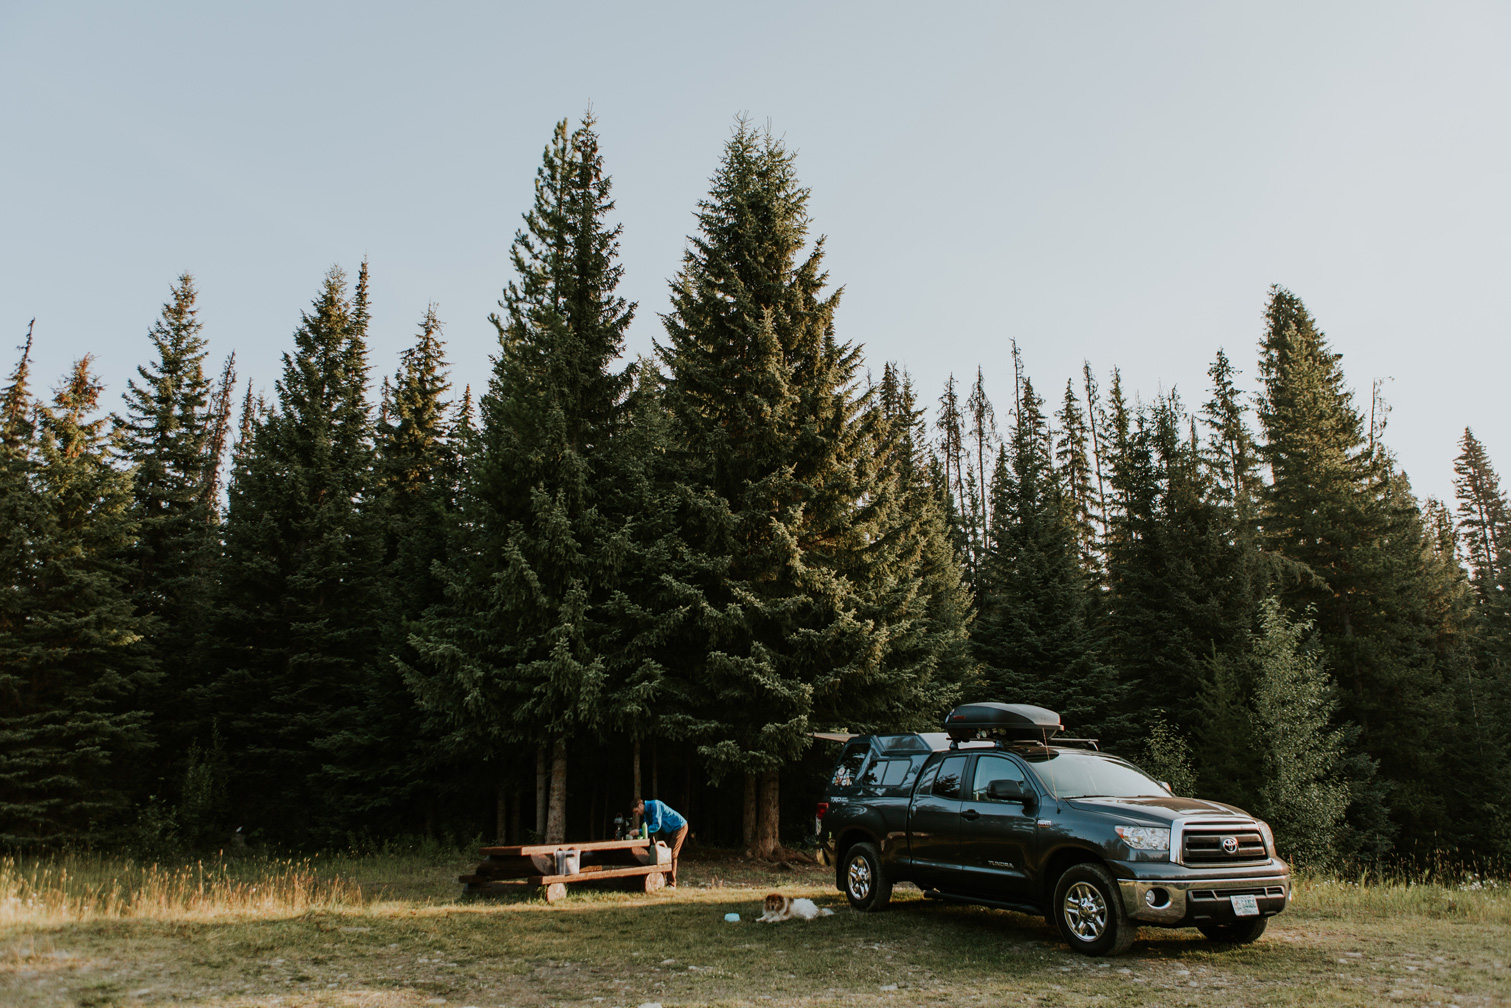 CindyGiovagnoli_BritishColumbia_Yukon_Alaska_roadtrip_AlCan_Alaskan_Highway_truck_camping-005.jpg